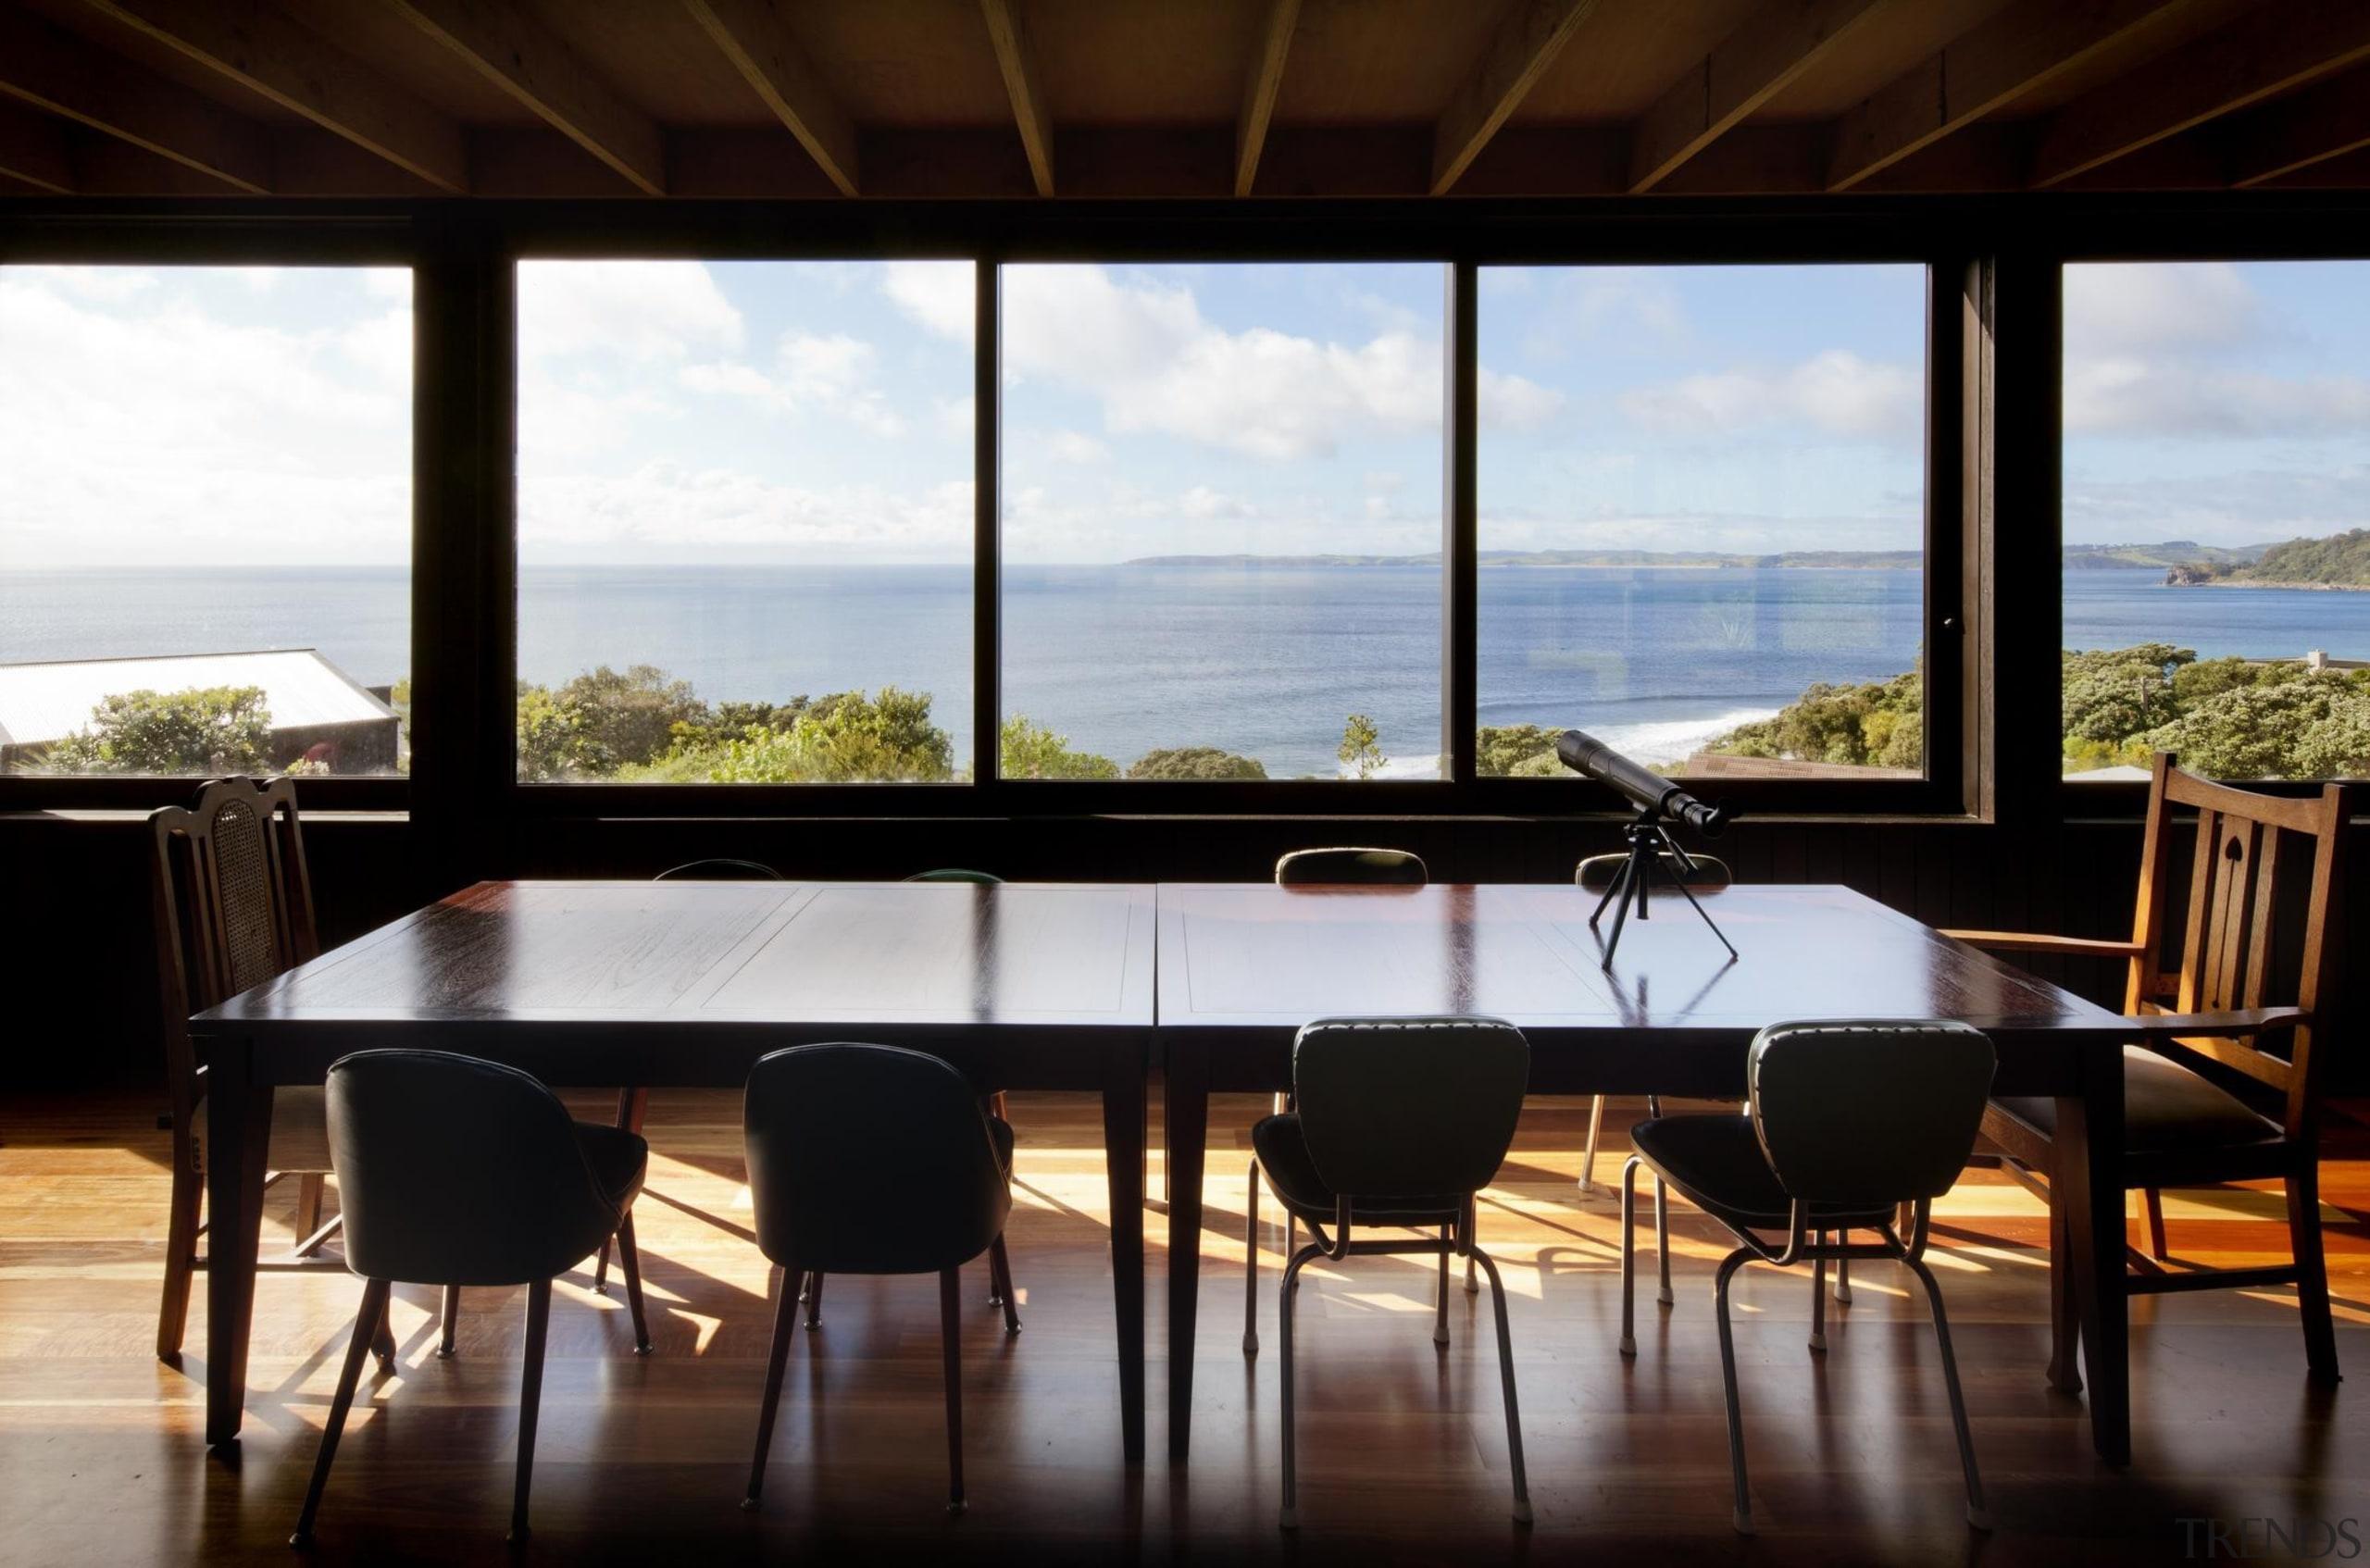 Leigh Bach - chair | furniture | house chair, furniture, house, interior design, real estate, table, window, black